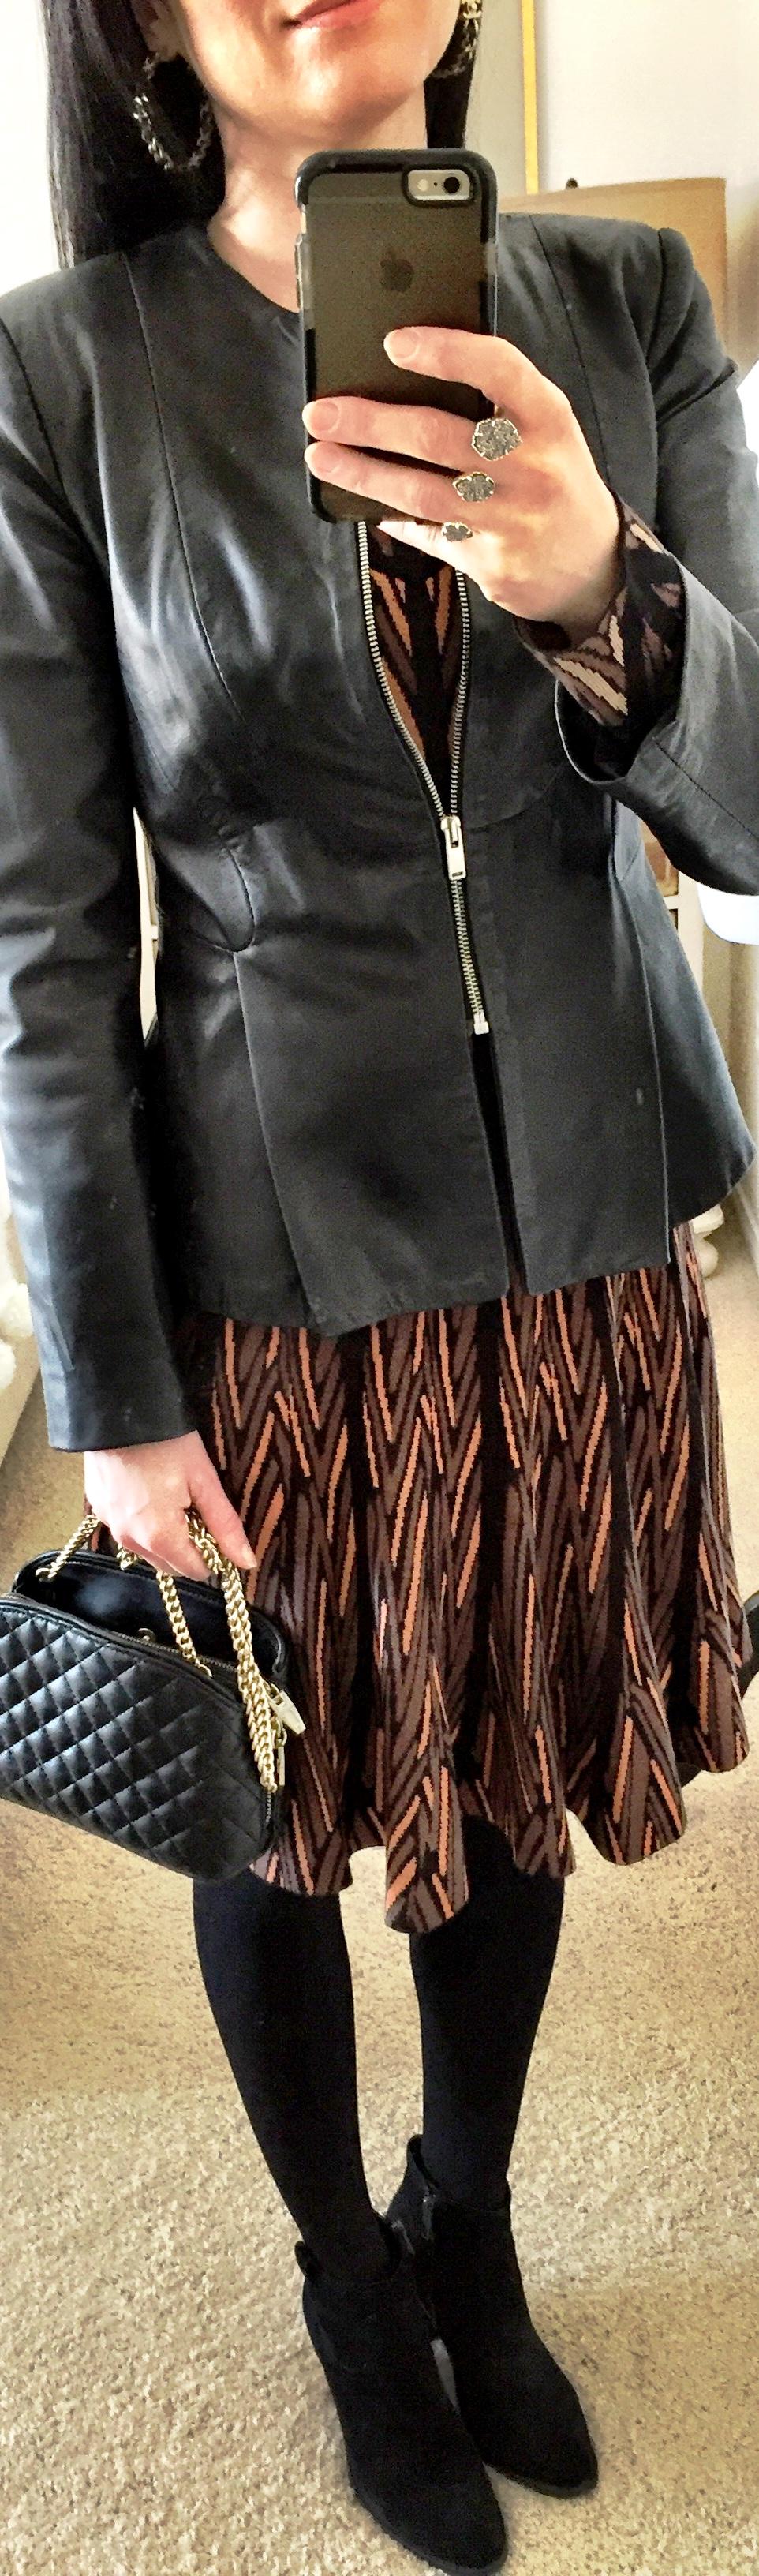 January 28, BCBG Knit dress with Leather Peplum Jacket